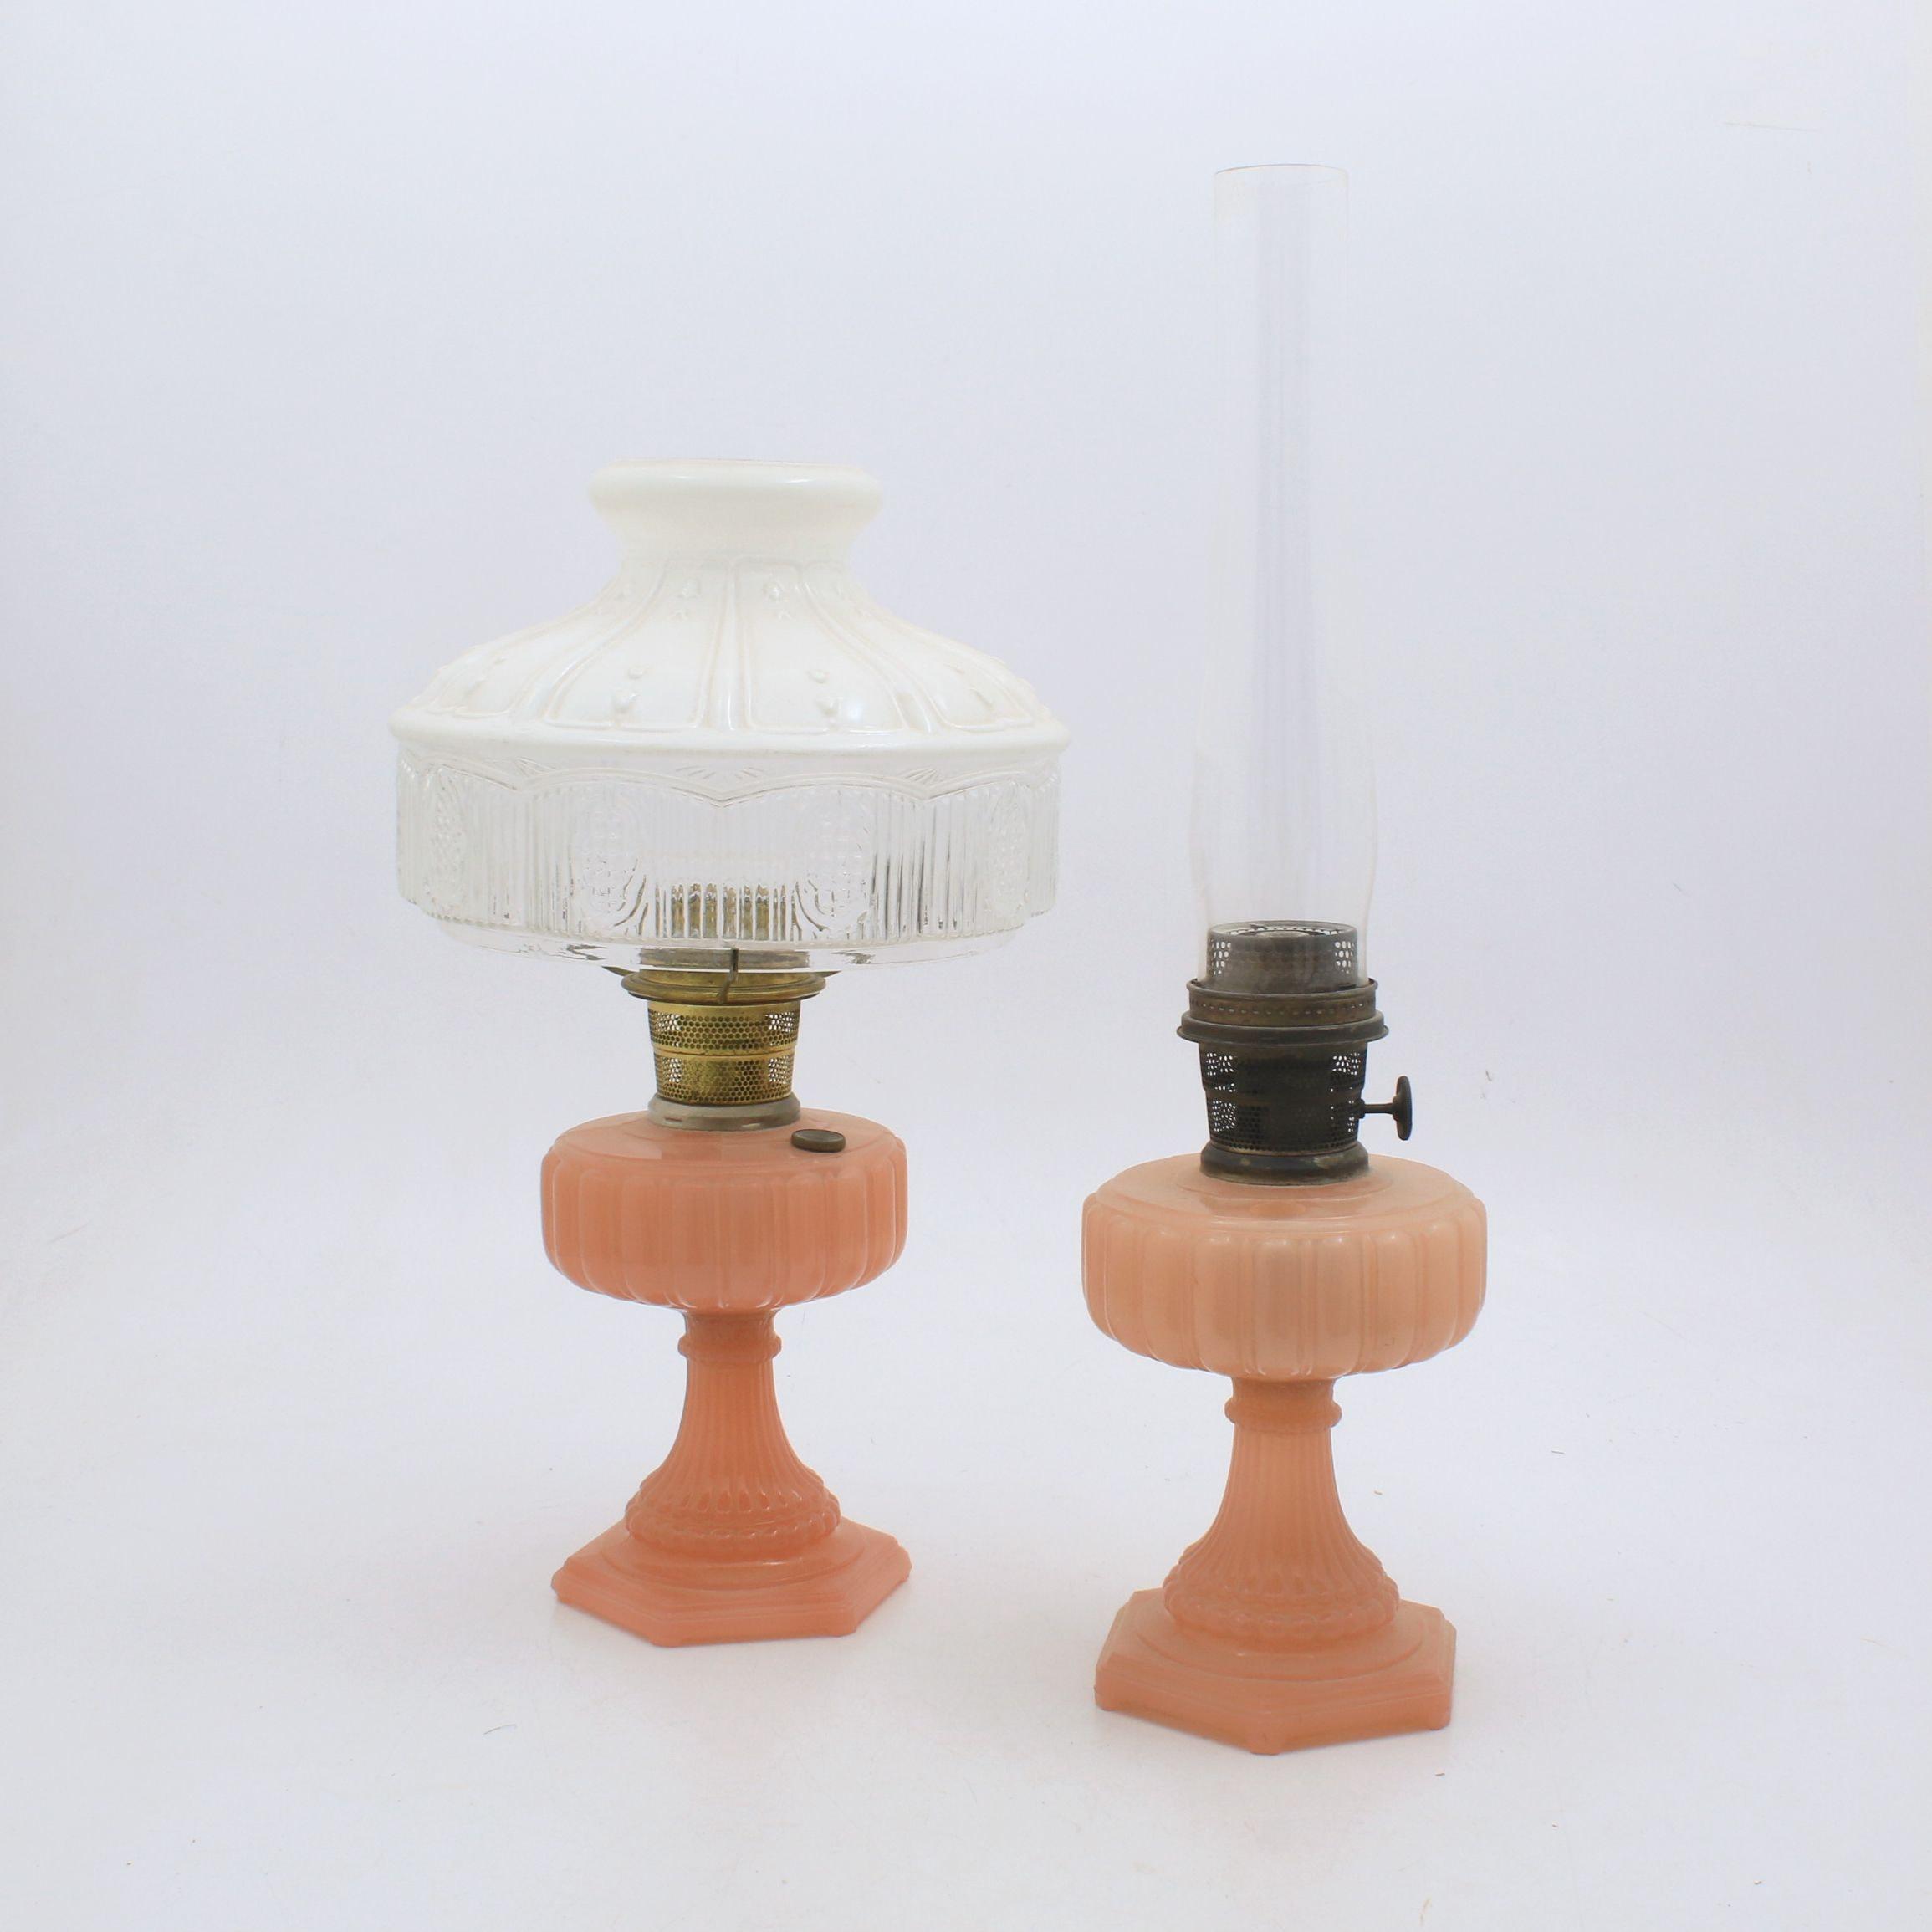 Aladdin Depression Glass Oil Lamps, Early 20th Century